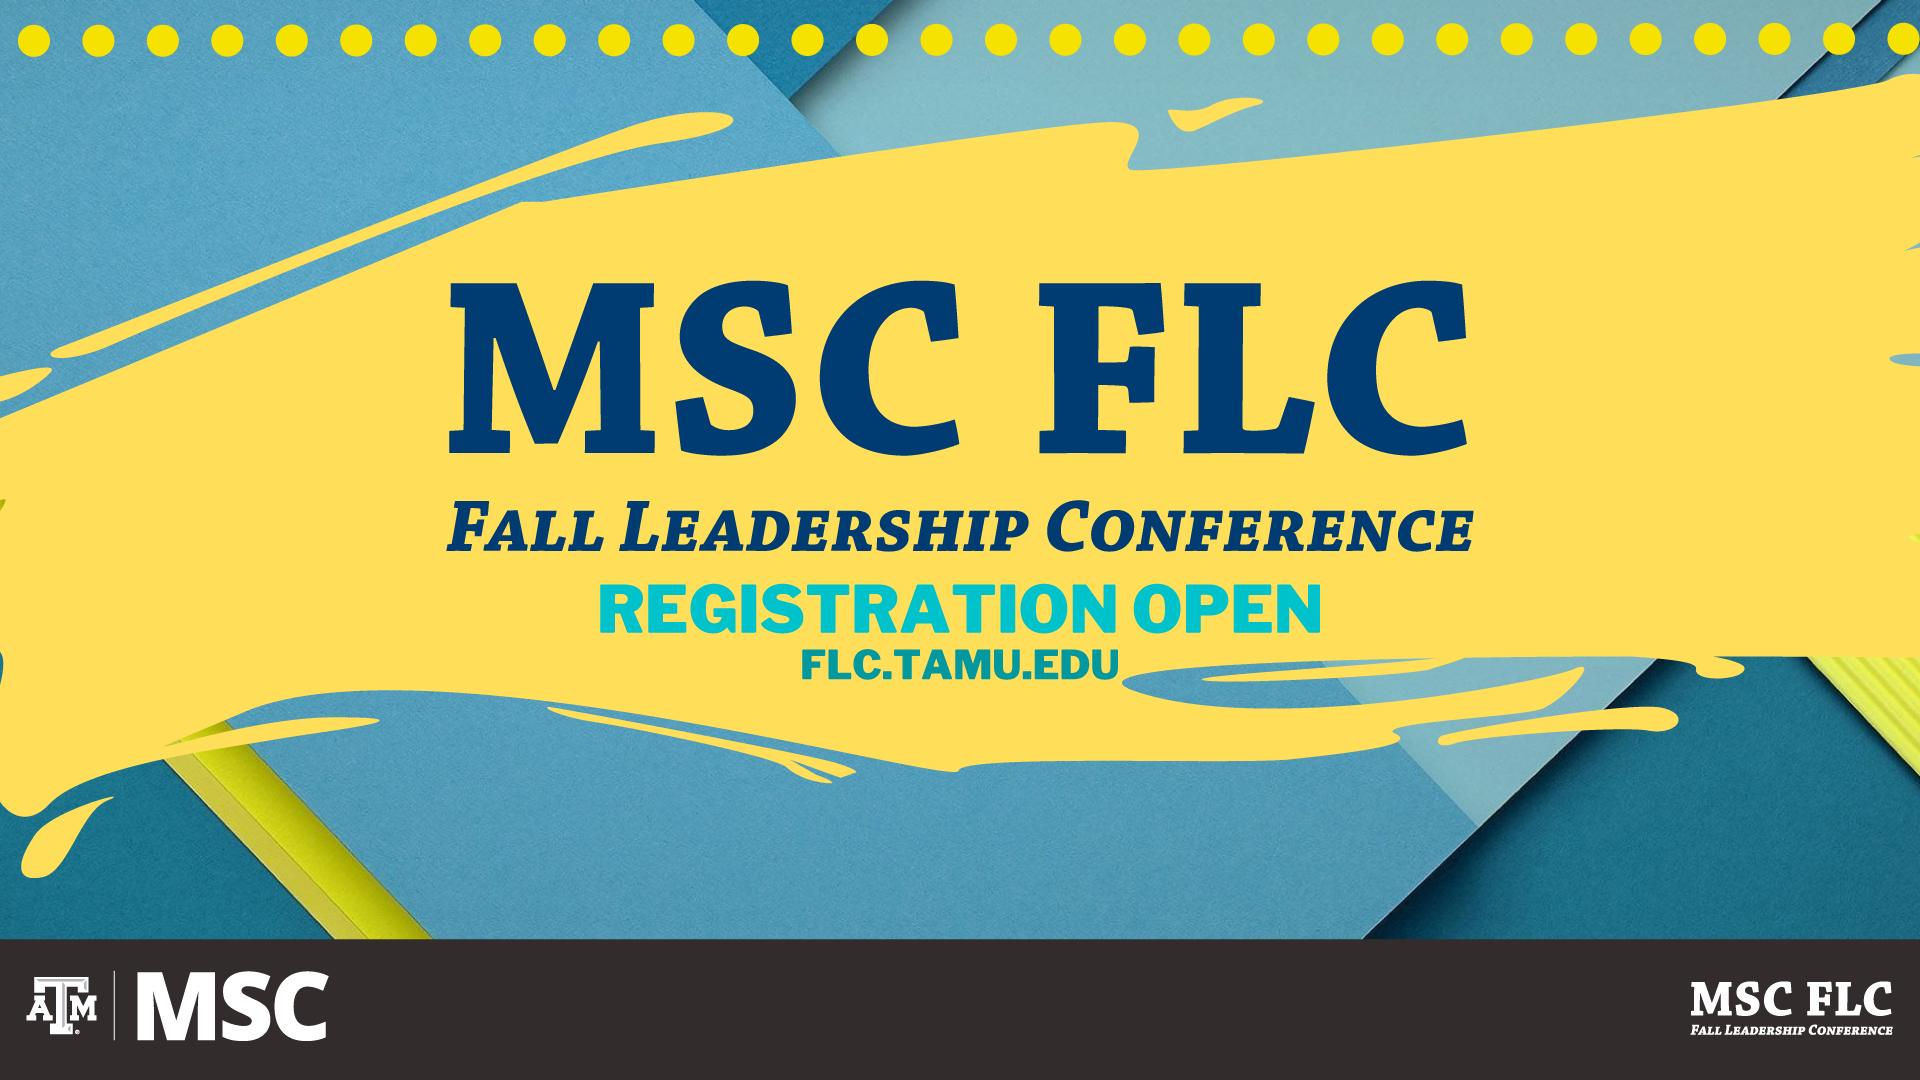 MSC FLC Fall Leadership Conference Registration Open at flc.tamu.edu